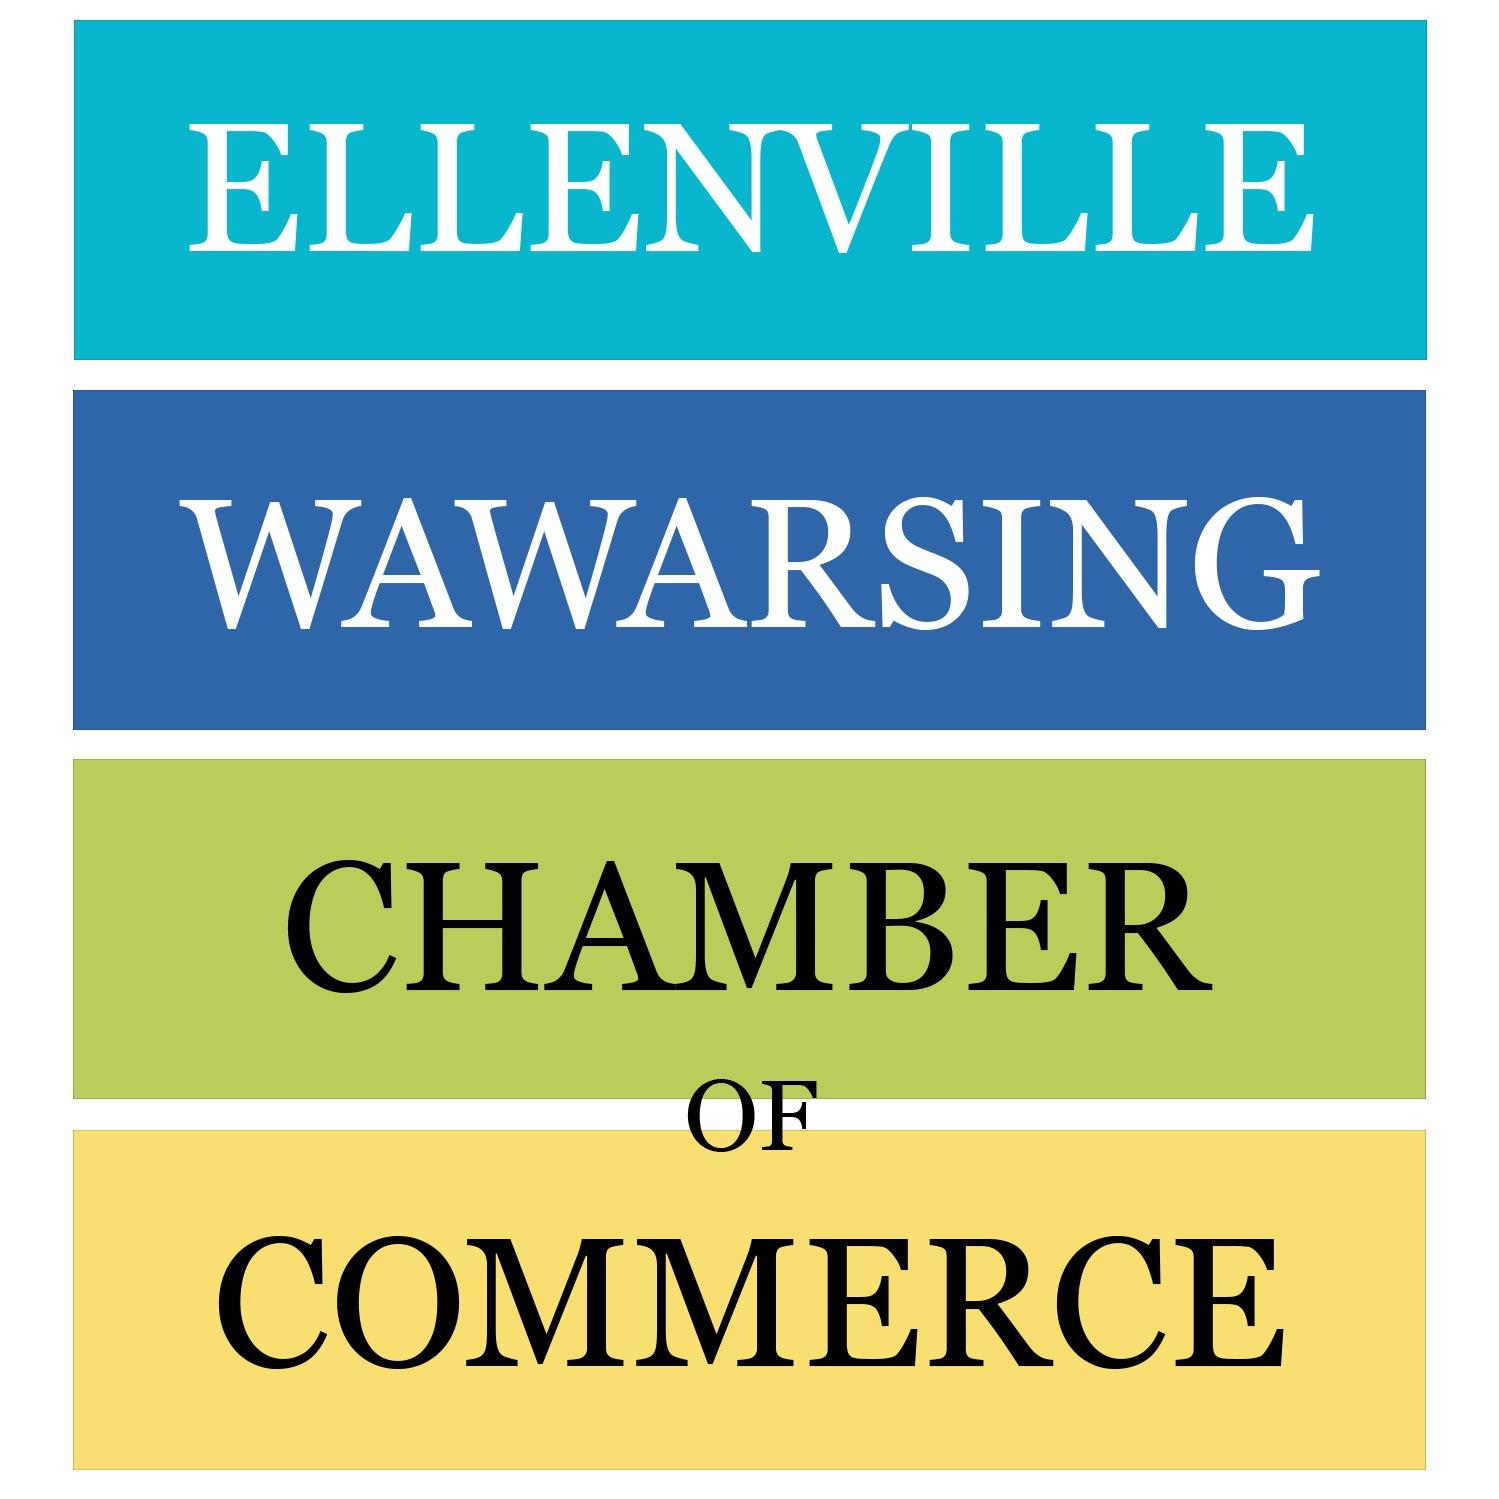 Ellenville-Wawarsing Chamber of Commerce